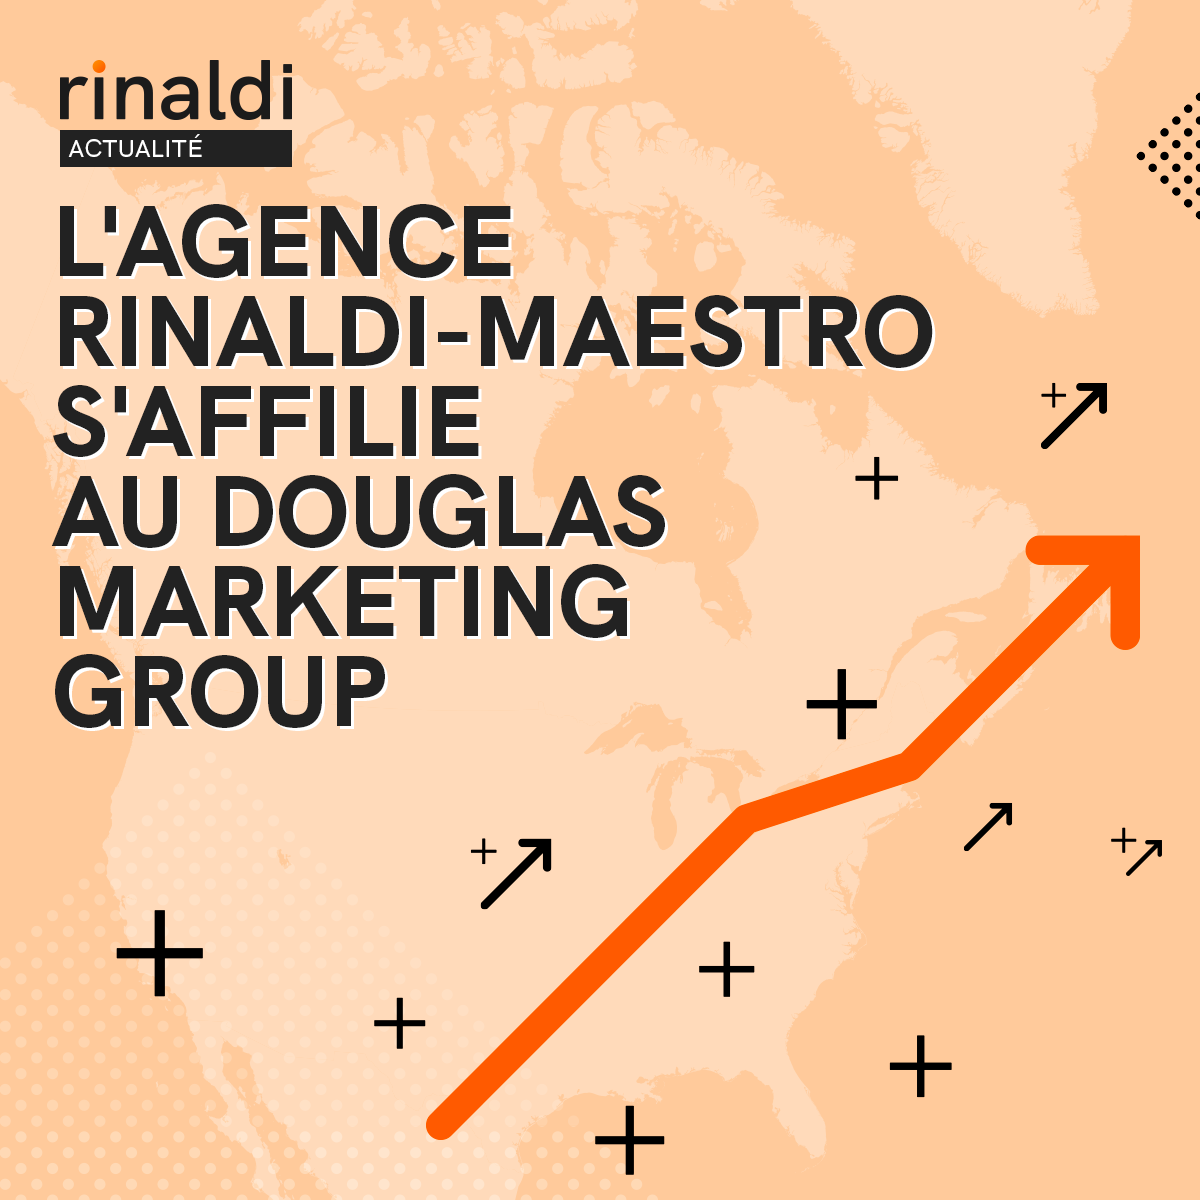 L'agence Rinaldi-Maestro s'affilie au Douglas Marketing Group